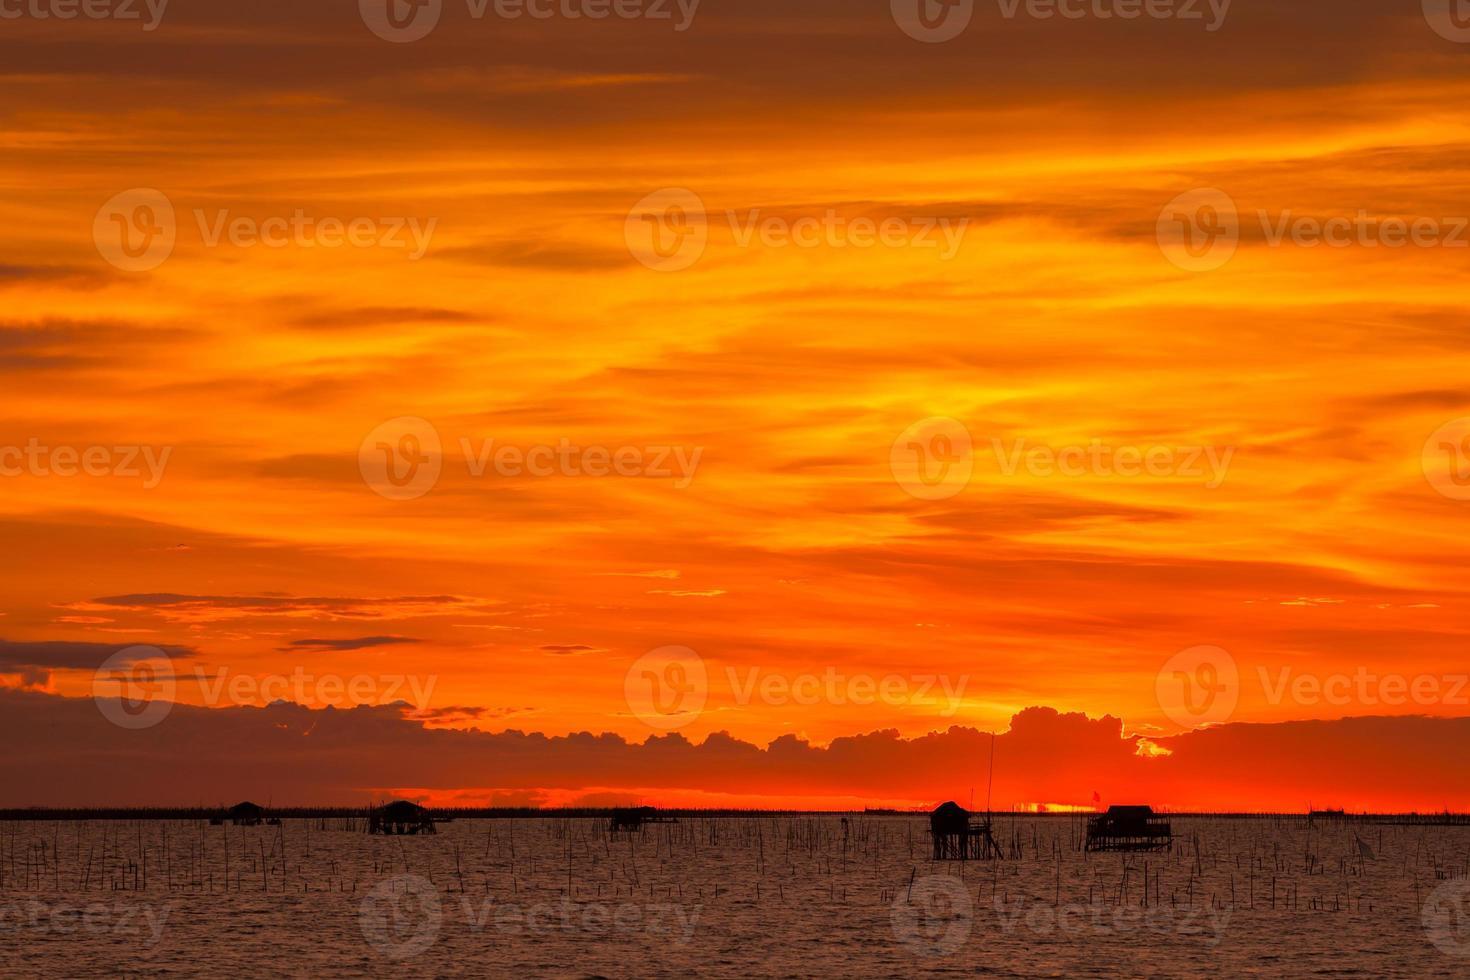 leuchtend orange Sonnenuntergang Himmel foto